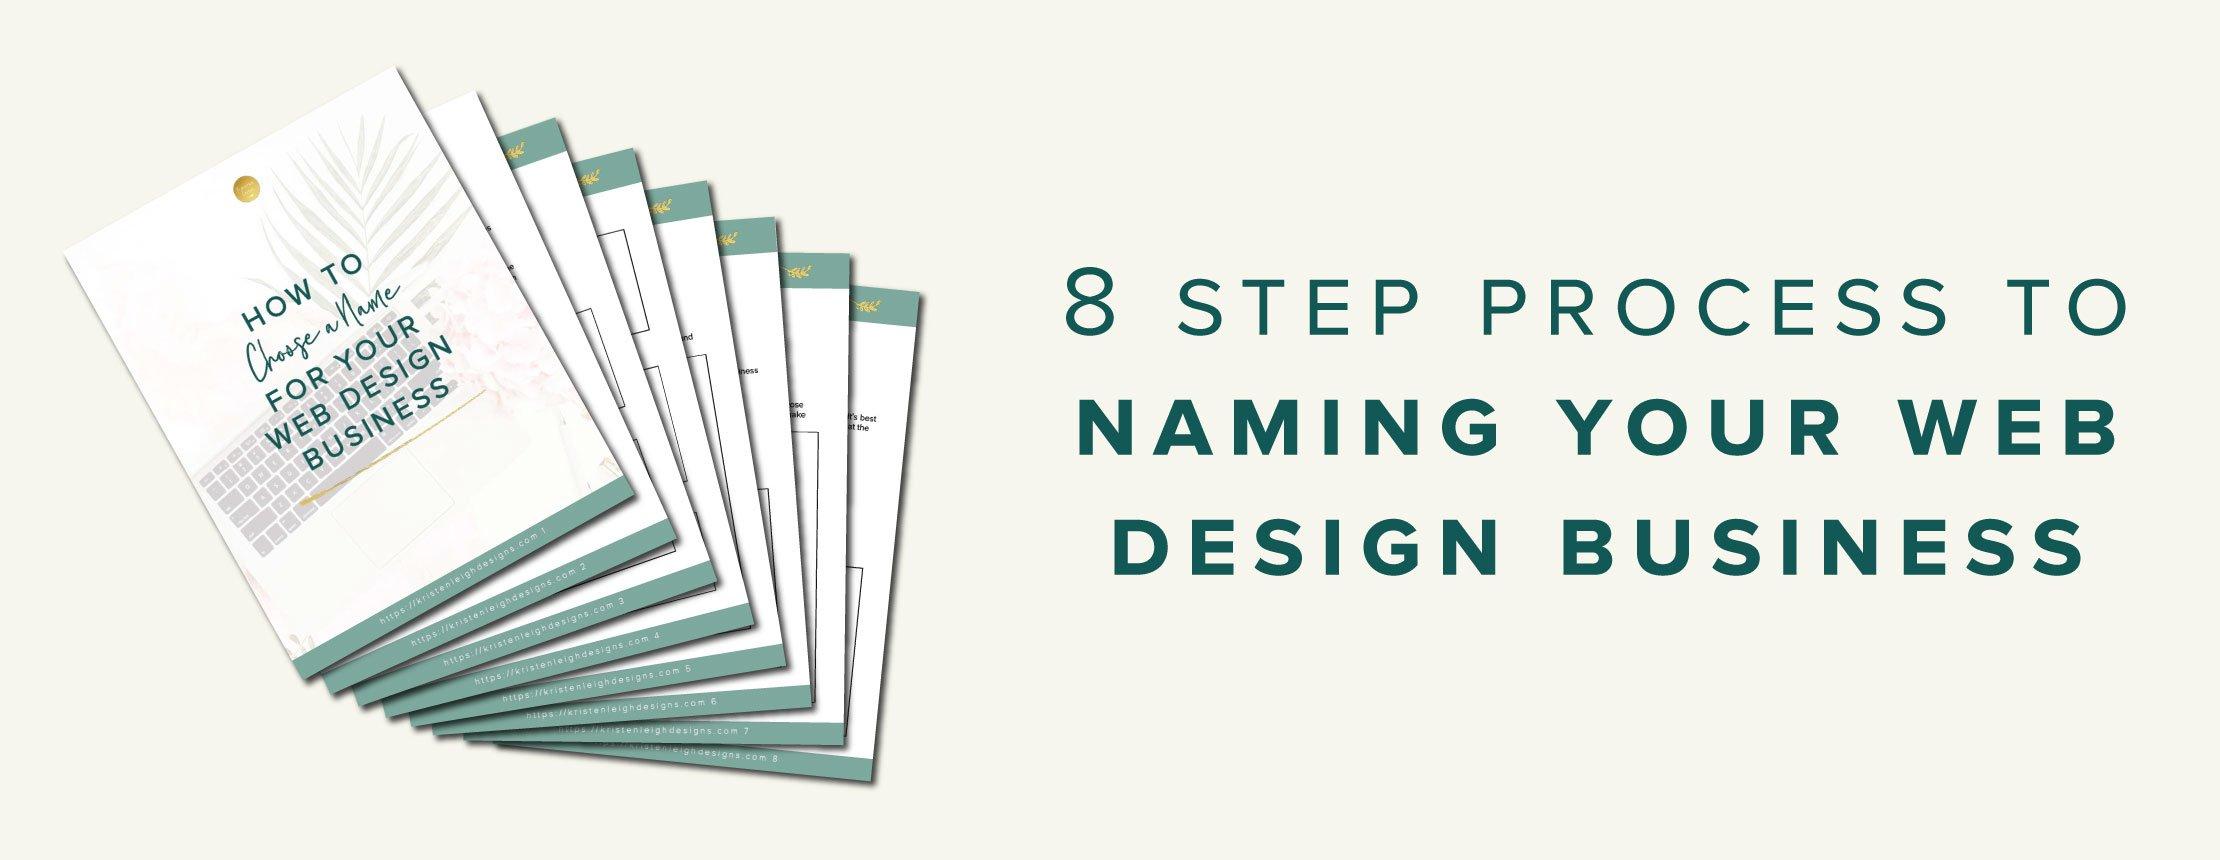 Kristen Leigh Designs | WordPress Web Design Studio | 8 Step Process to Naming Your Web Design Business Worksheet